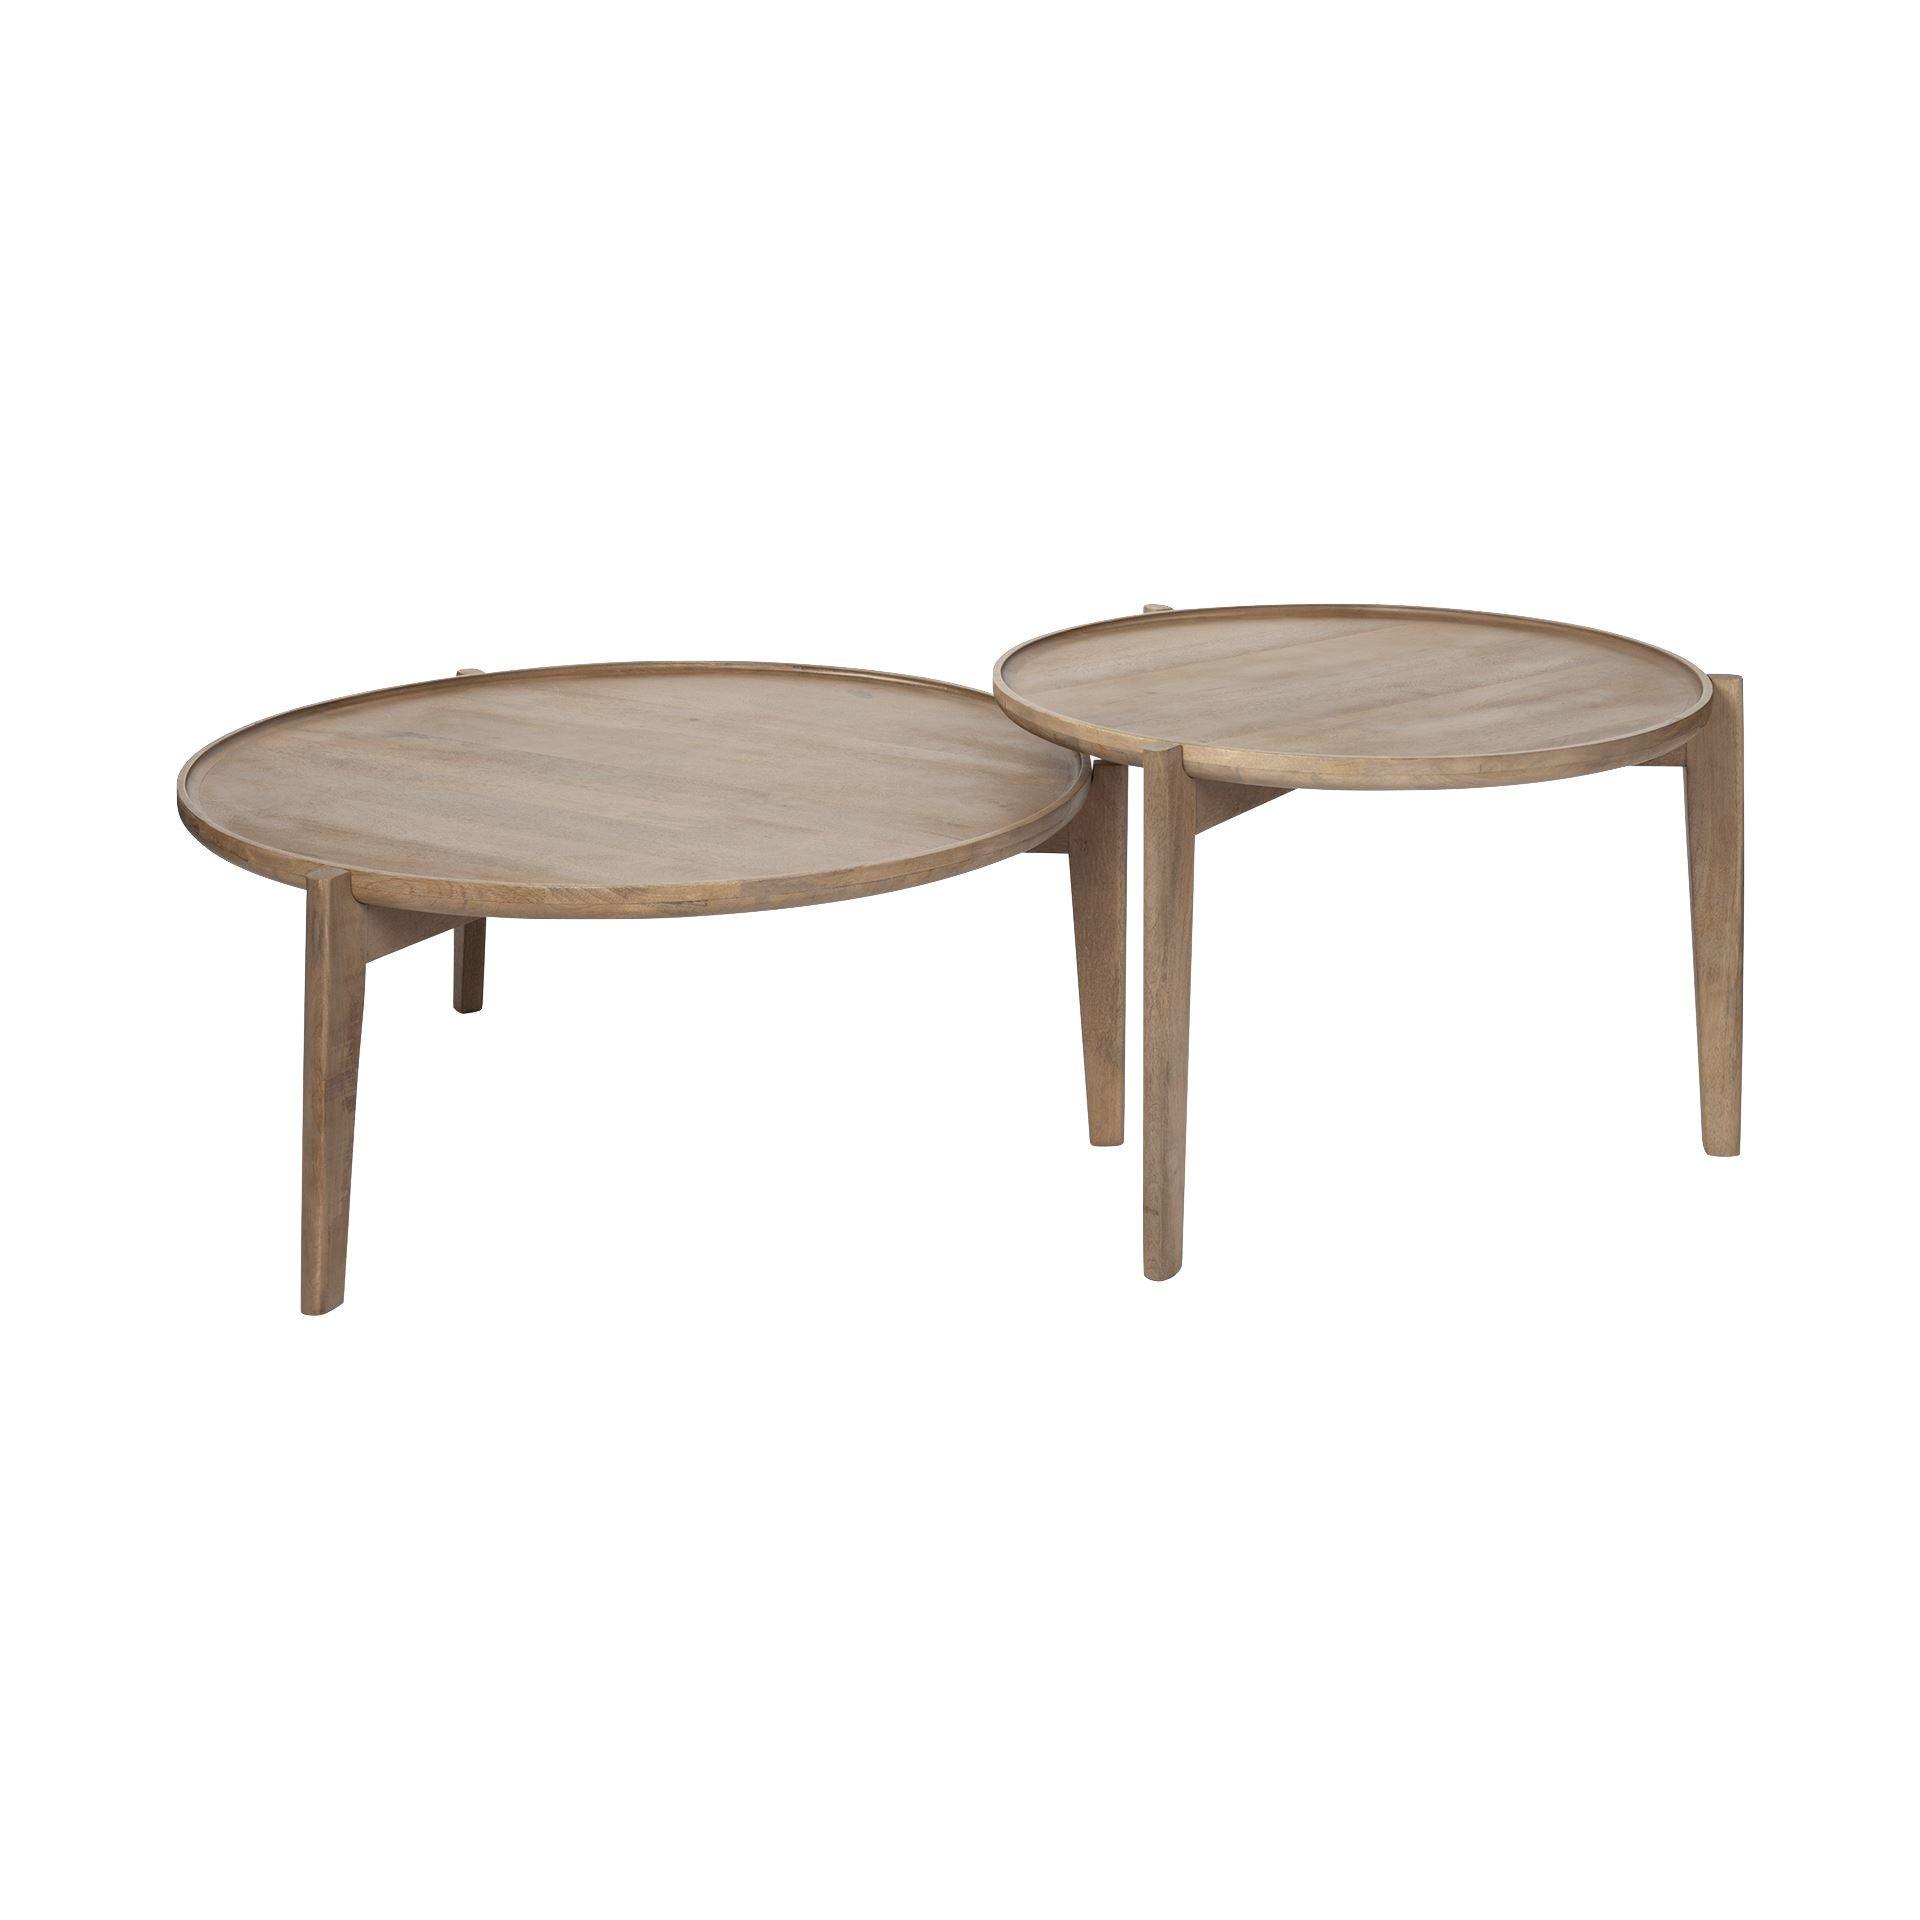 French Set Of Two Round Coffee Tables Mesa De Centro Redonda Branca Mesa Redonda De Vidro Mesas De Centro Quadradas [ 2000 x 2000 Pixel ]